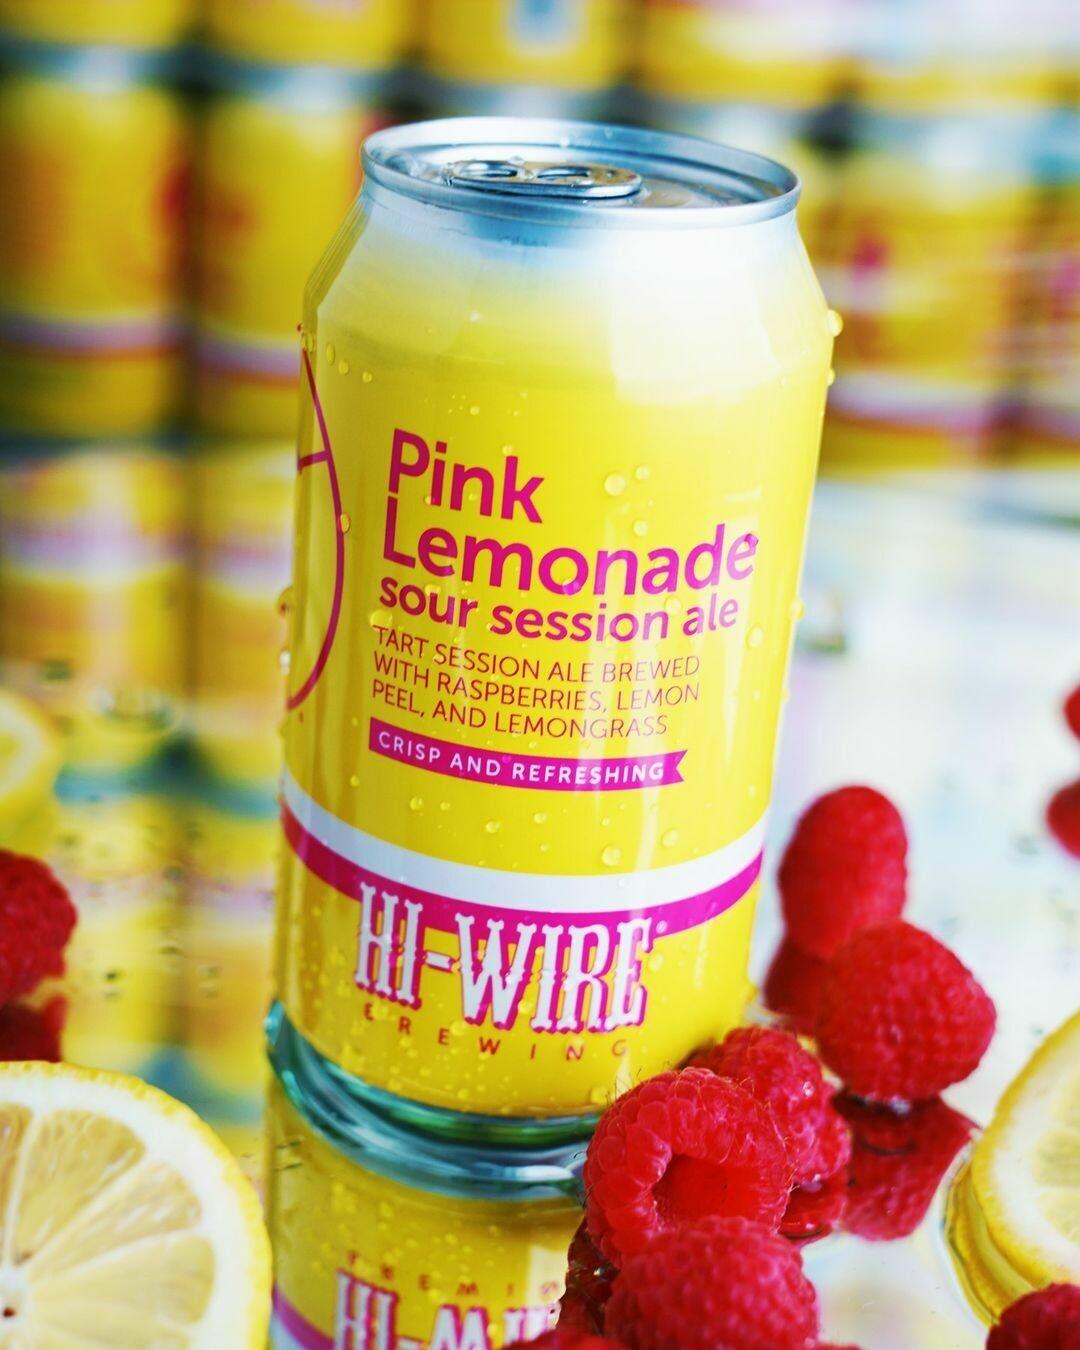 Hi Wire Pink Lemonade Sour Ale (6-PACK)